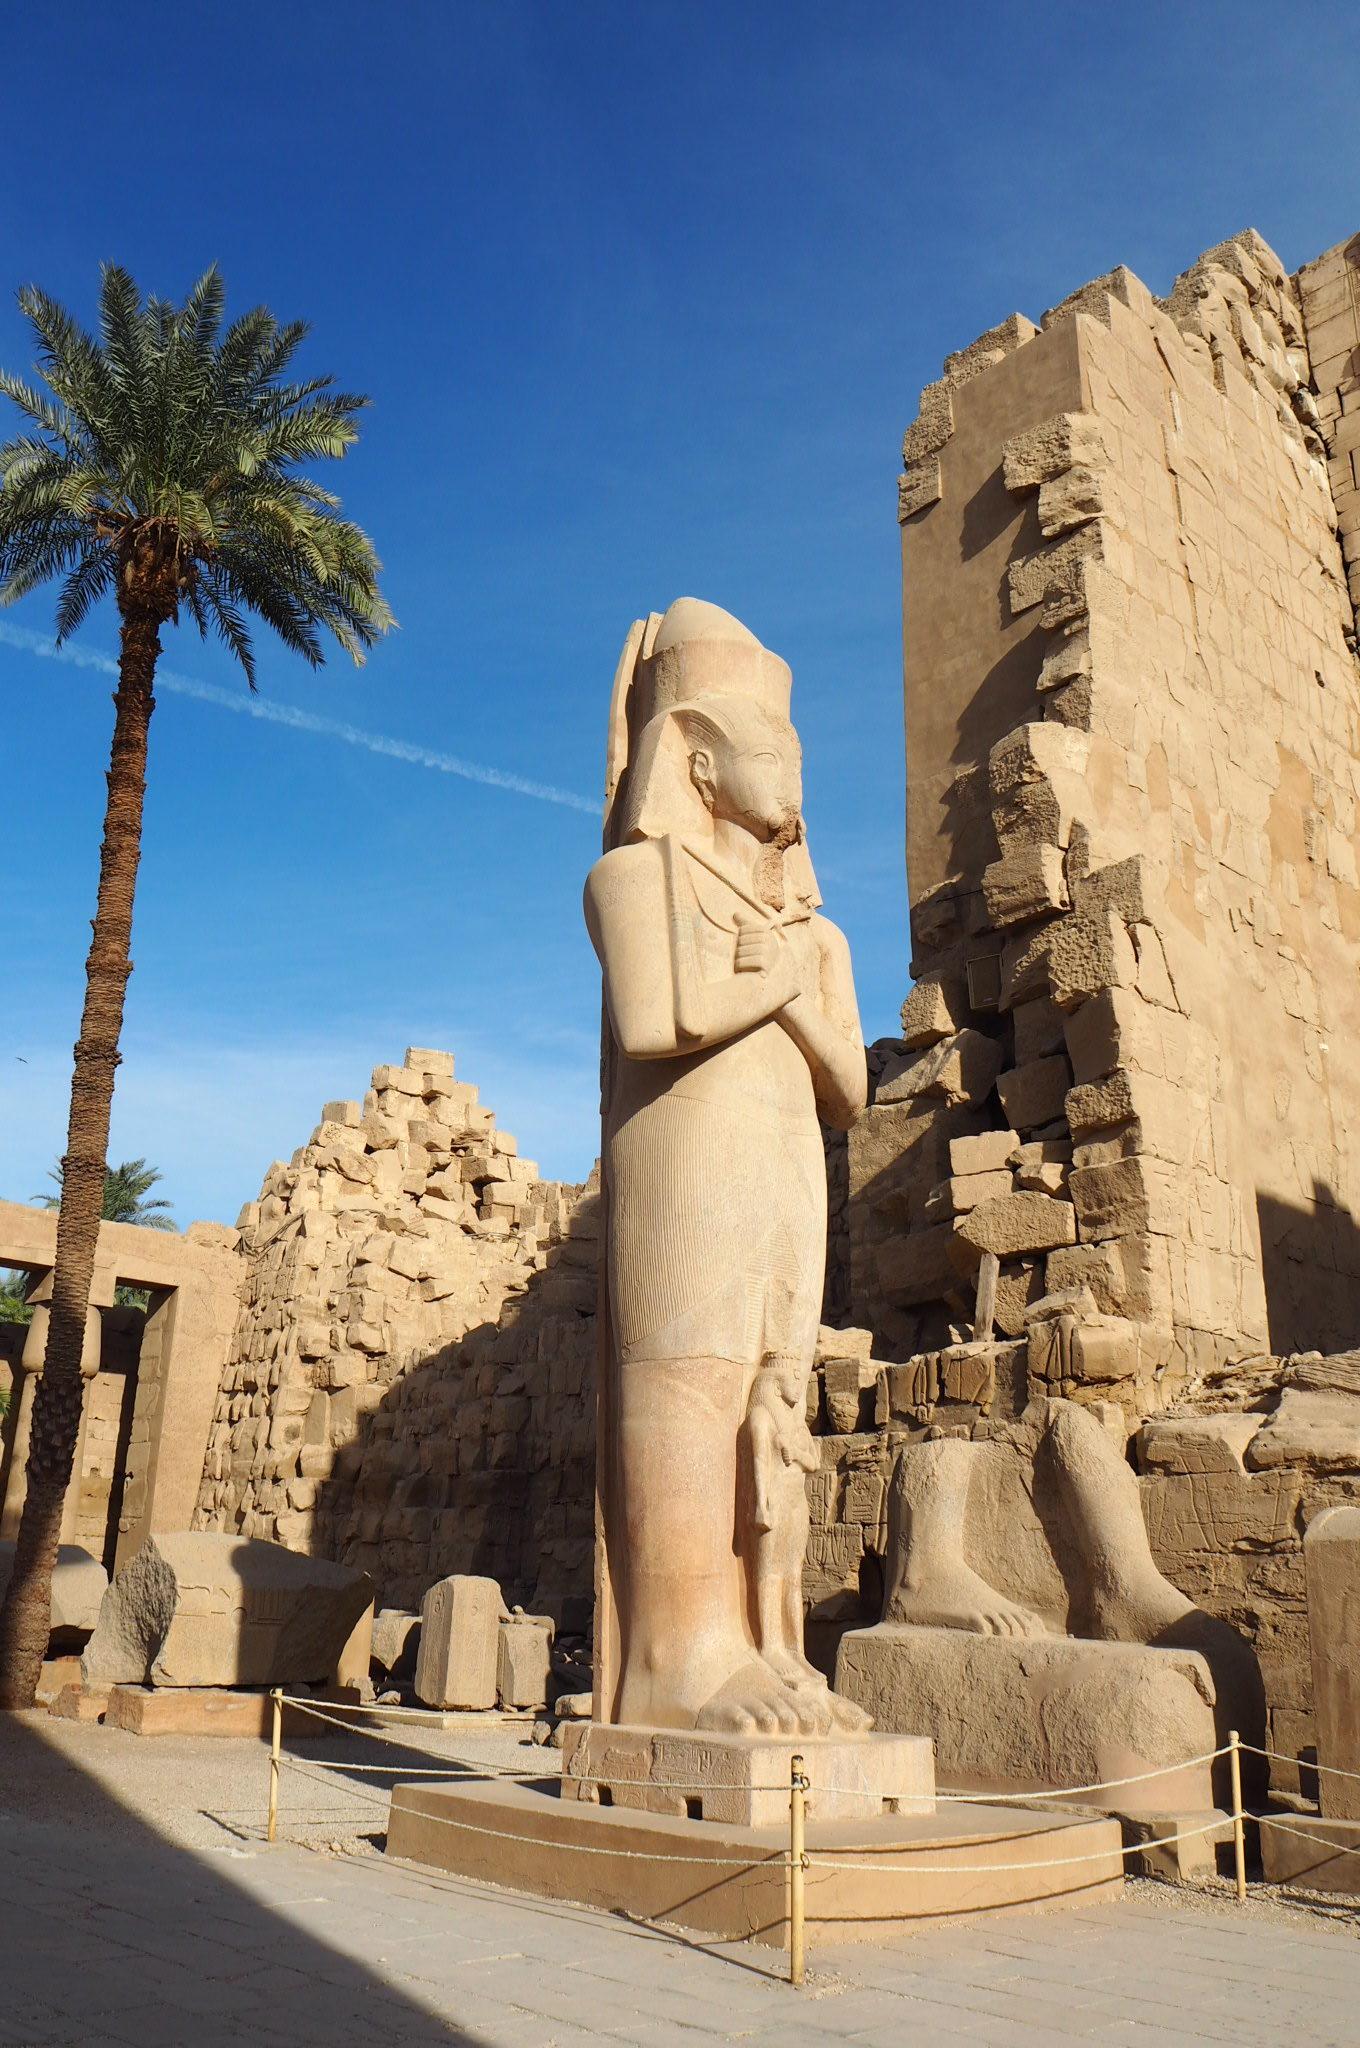 Ägypten Egypt El Quesir Hurghada Luxor Trip Travel Morgenland Reisen